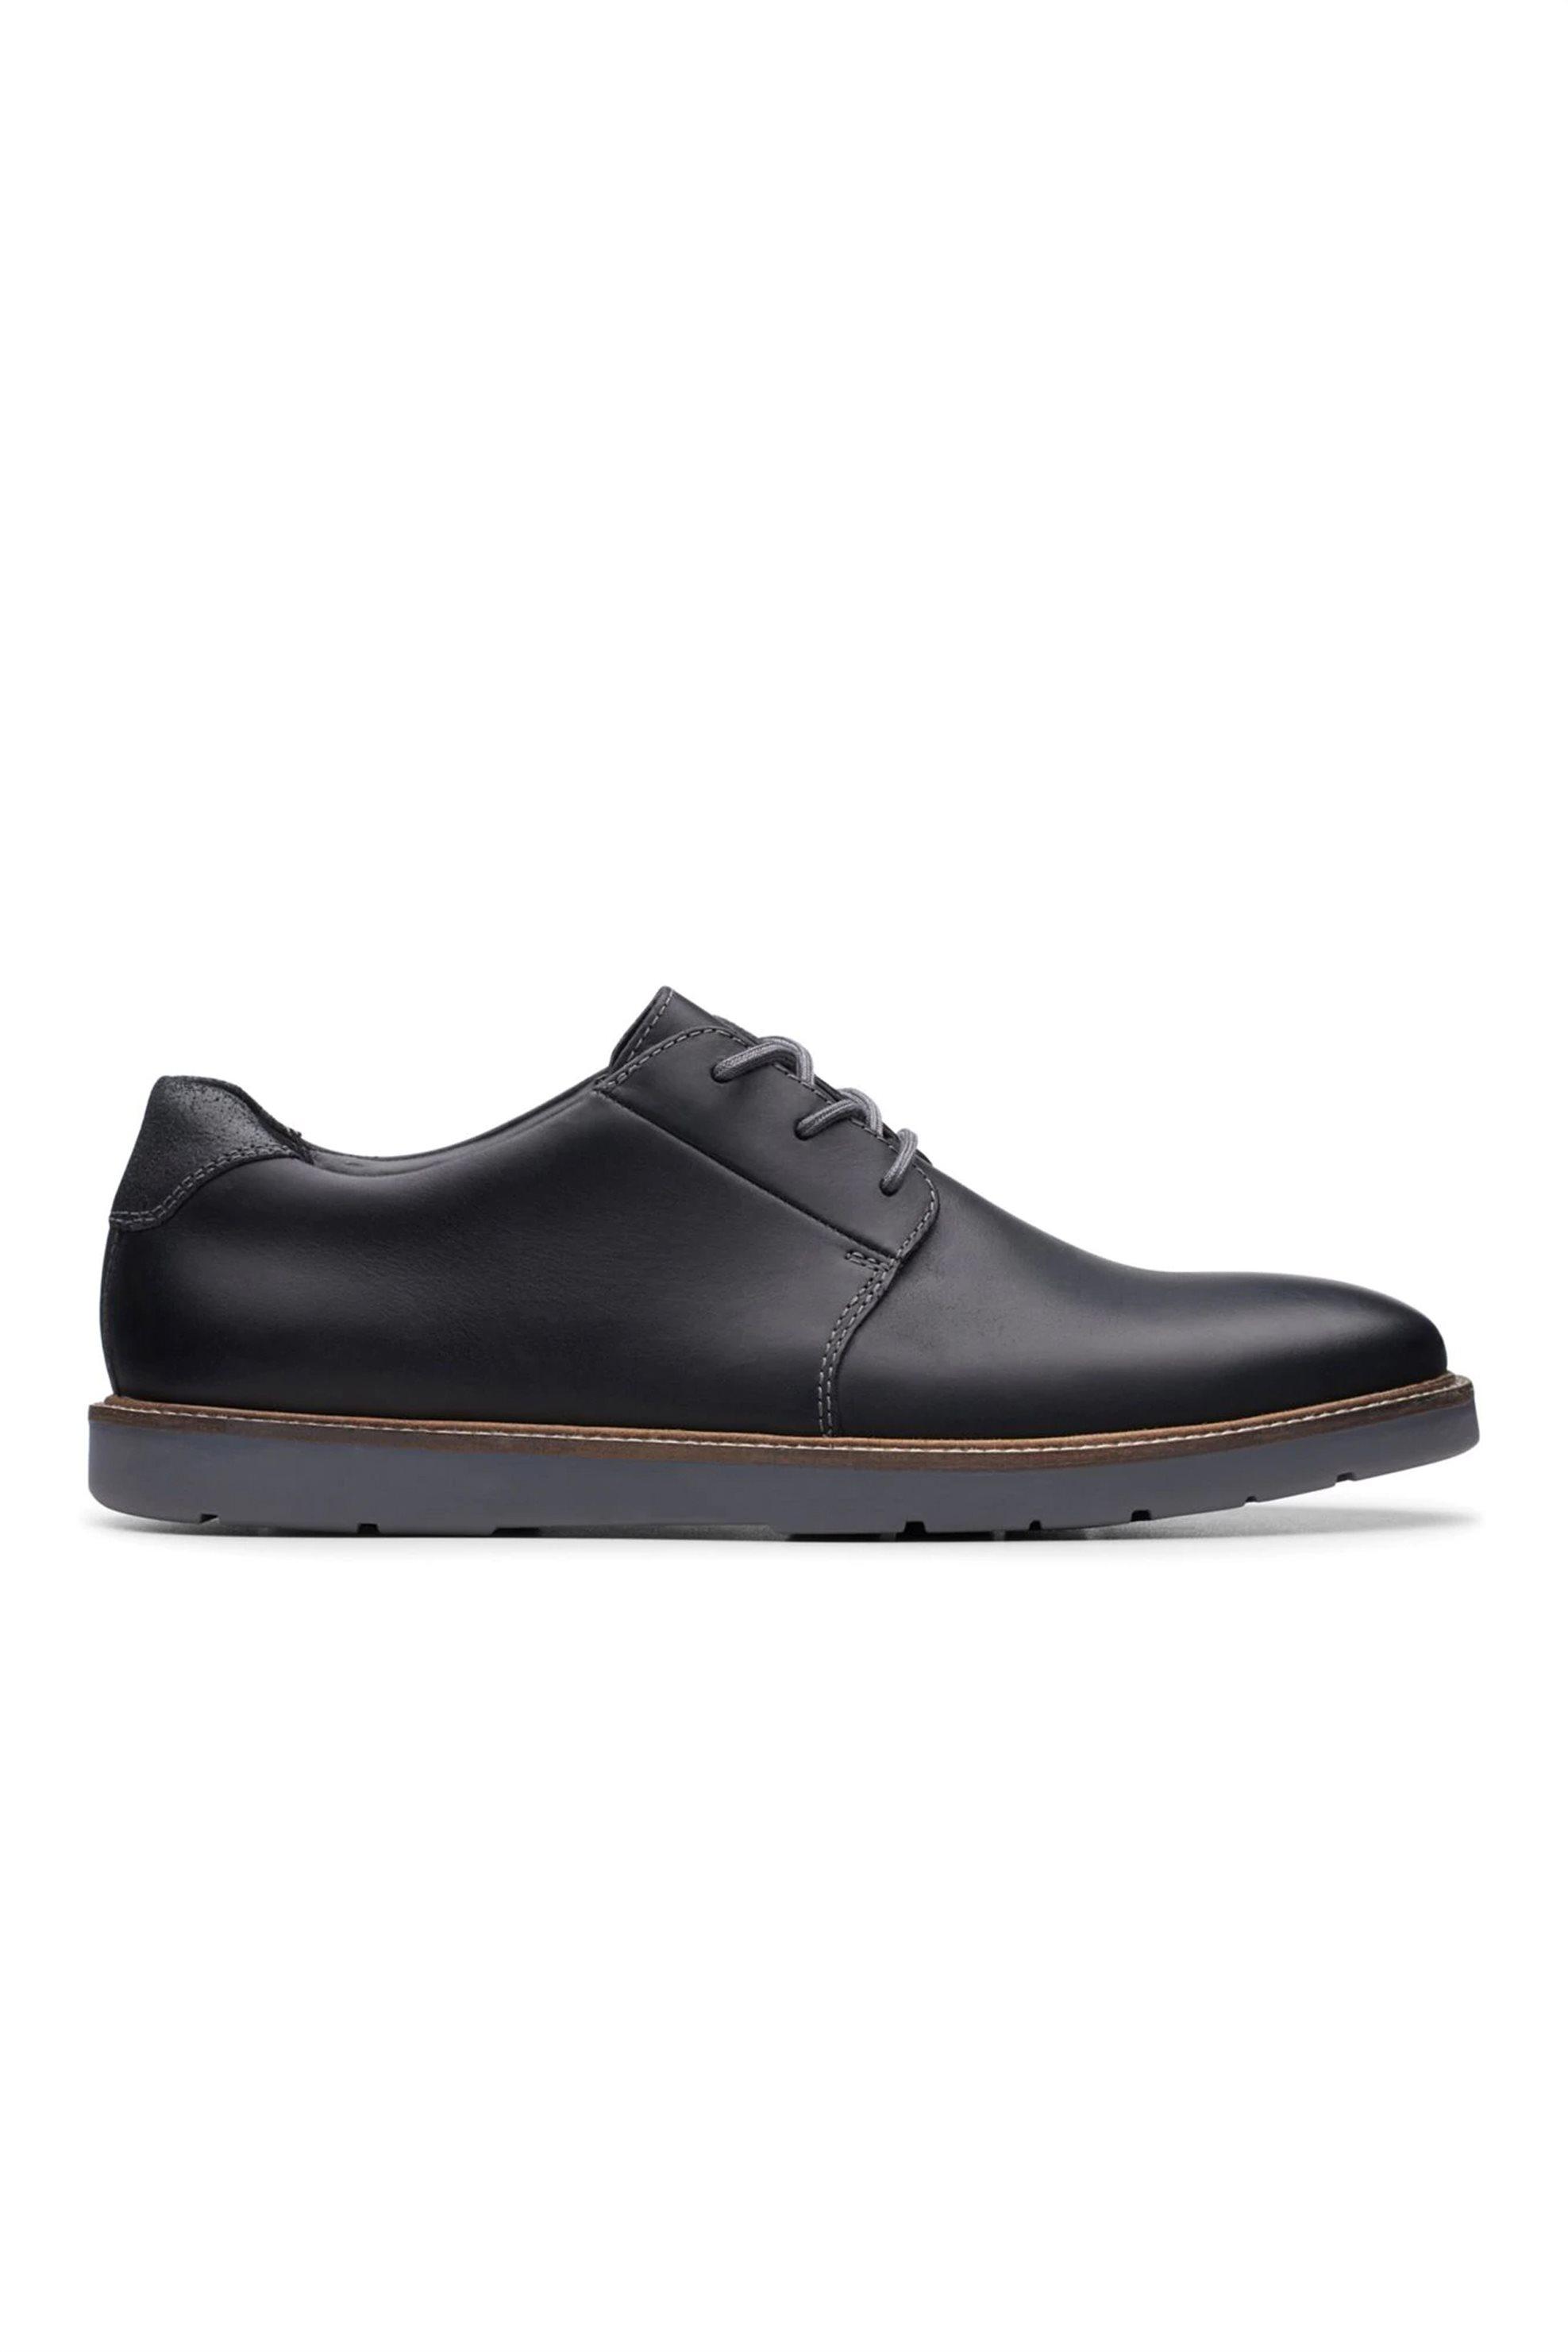 Clarks ανδρικά δερμάτινα παπούτσια «Grandin Plain» – 26138371 – Μαύρο